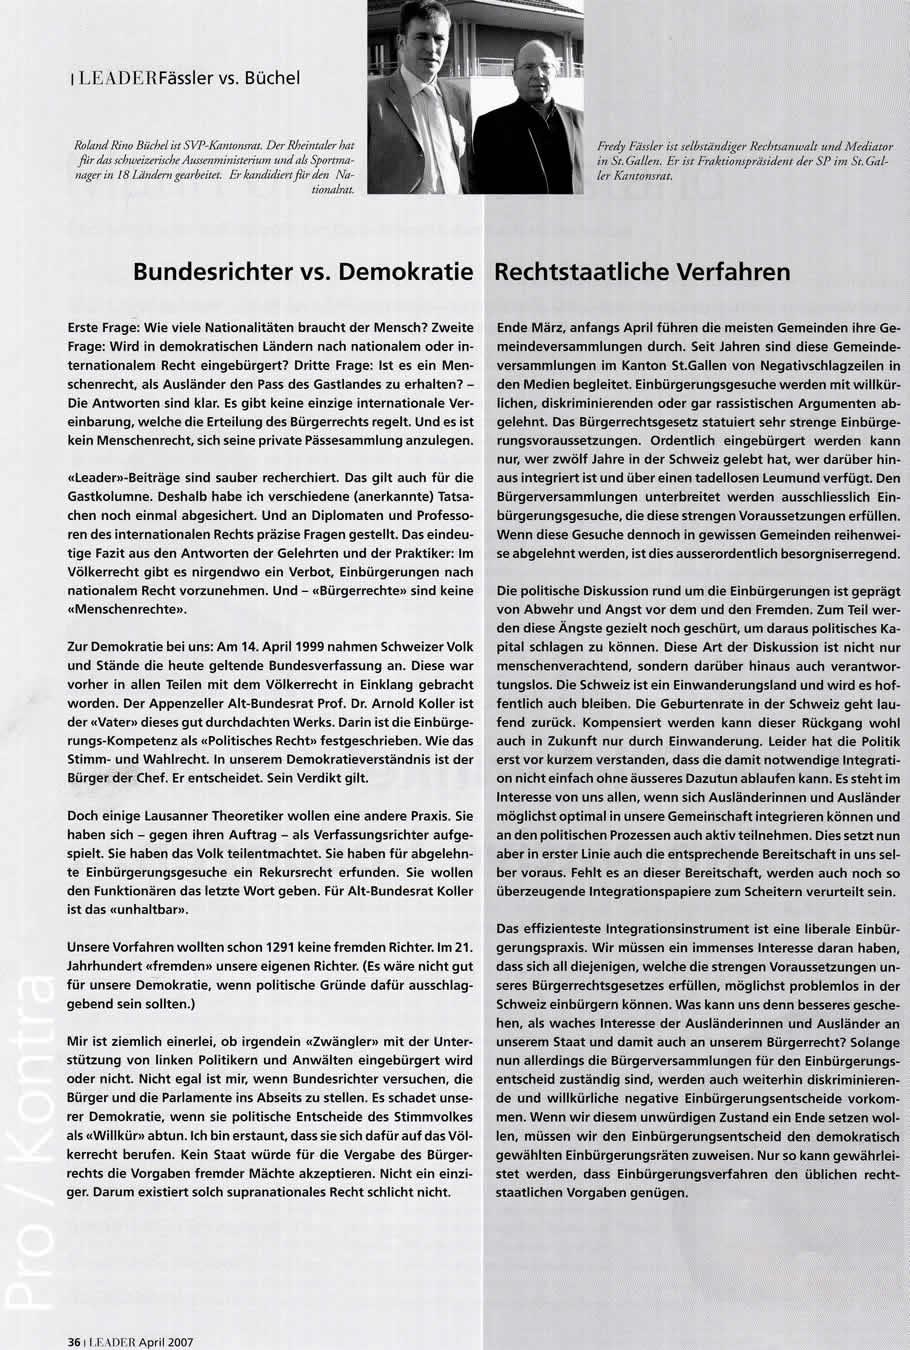 Fässler vs. Büchel - Bundesrichter vs. Demokratie